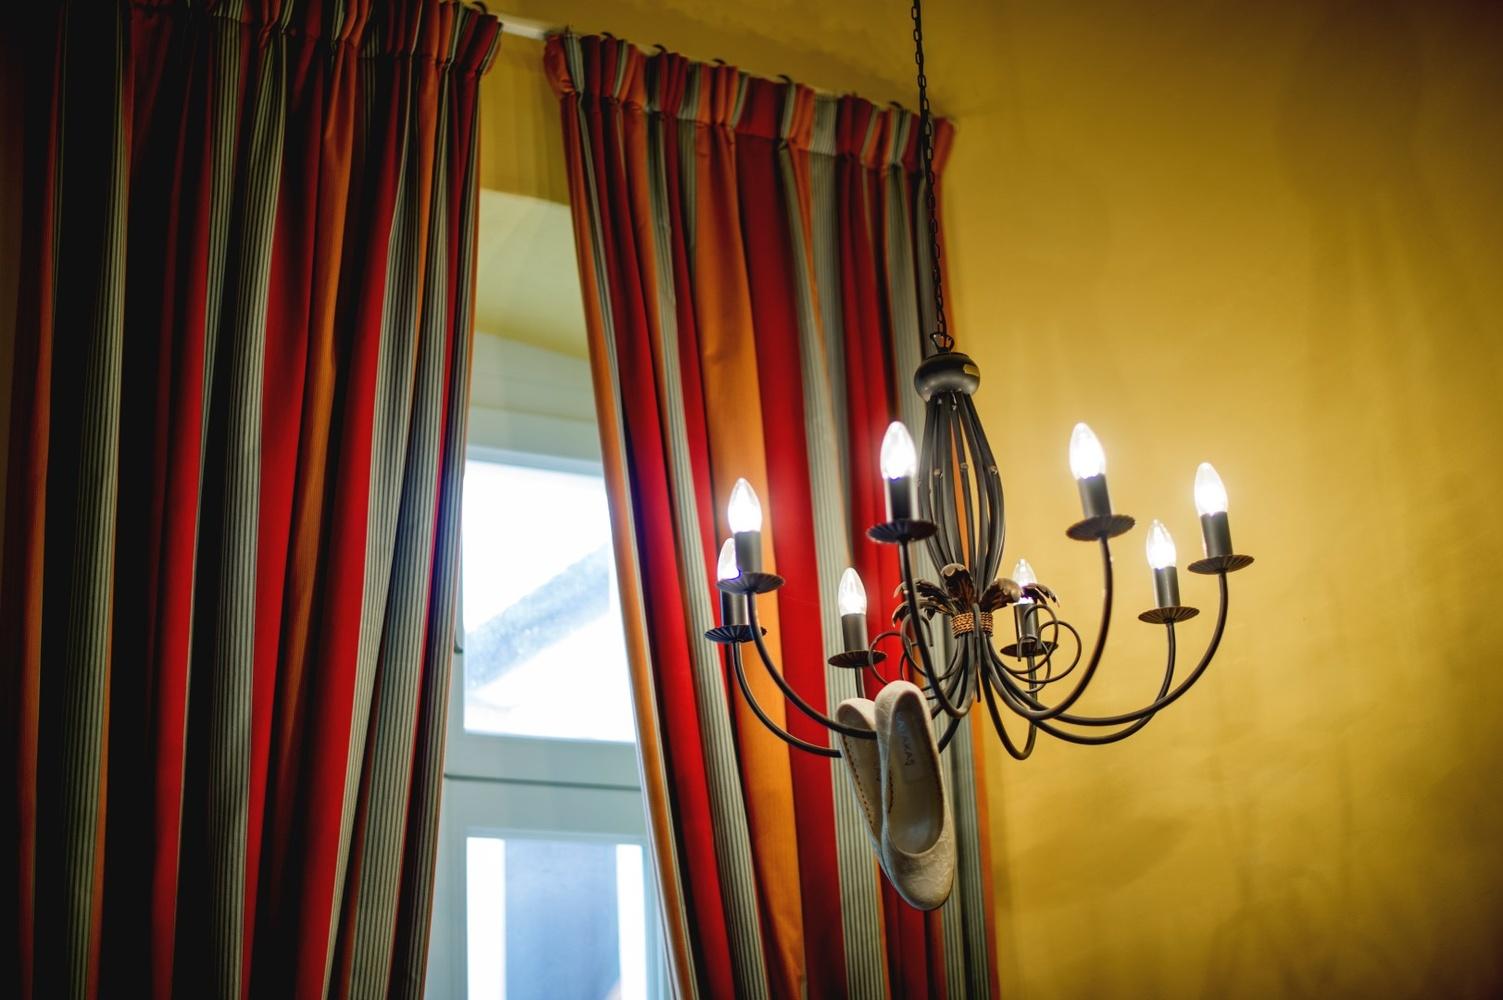 http://www.fotoz.sk/images/gallery-12/normal/svadba_hotel-chateau-bela_001.jpg